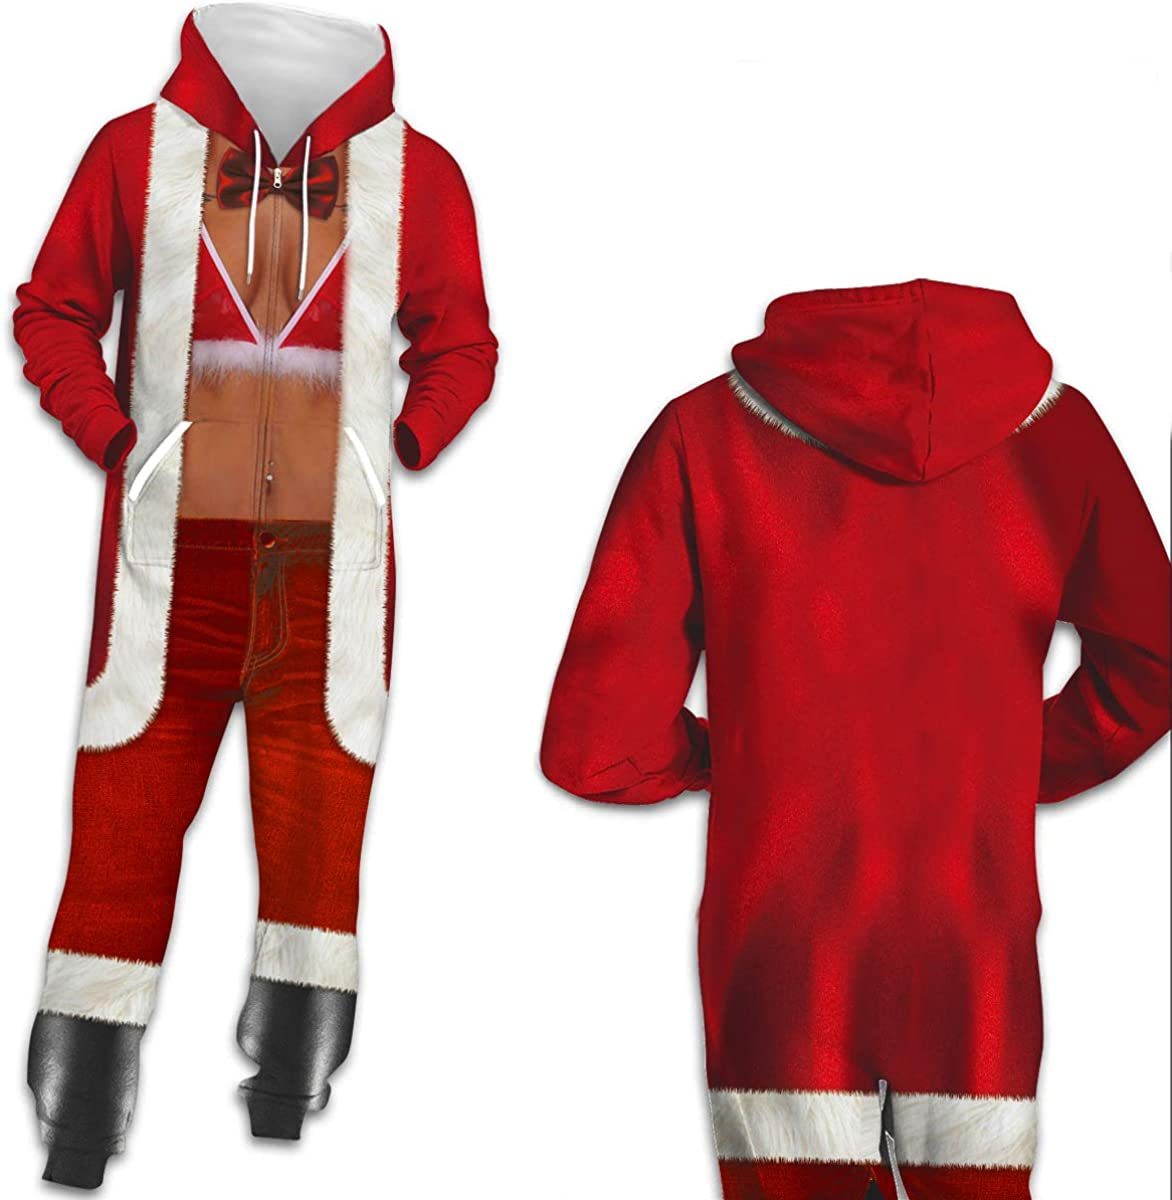 URVIP Unisex Family Sleepwear 3D Printed Jumpsuit Adult Nightwear Romper